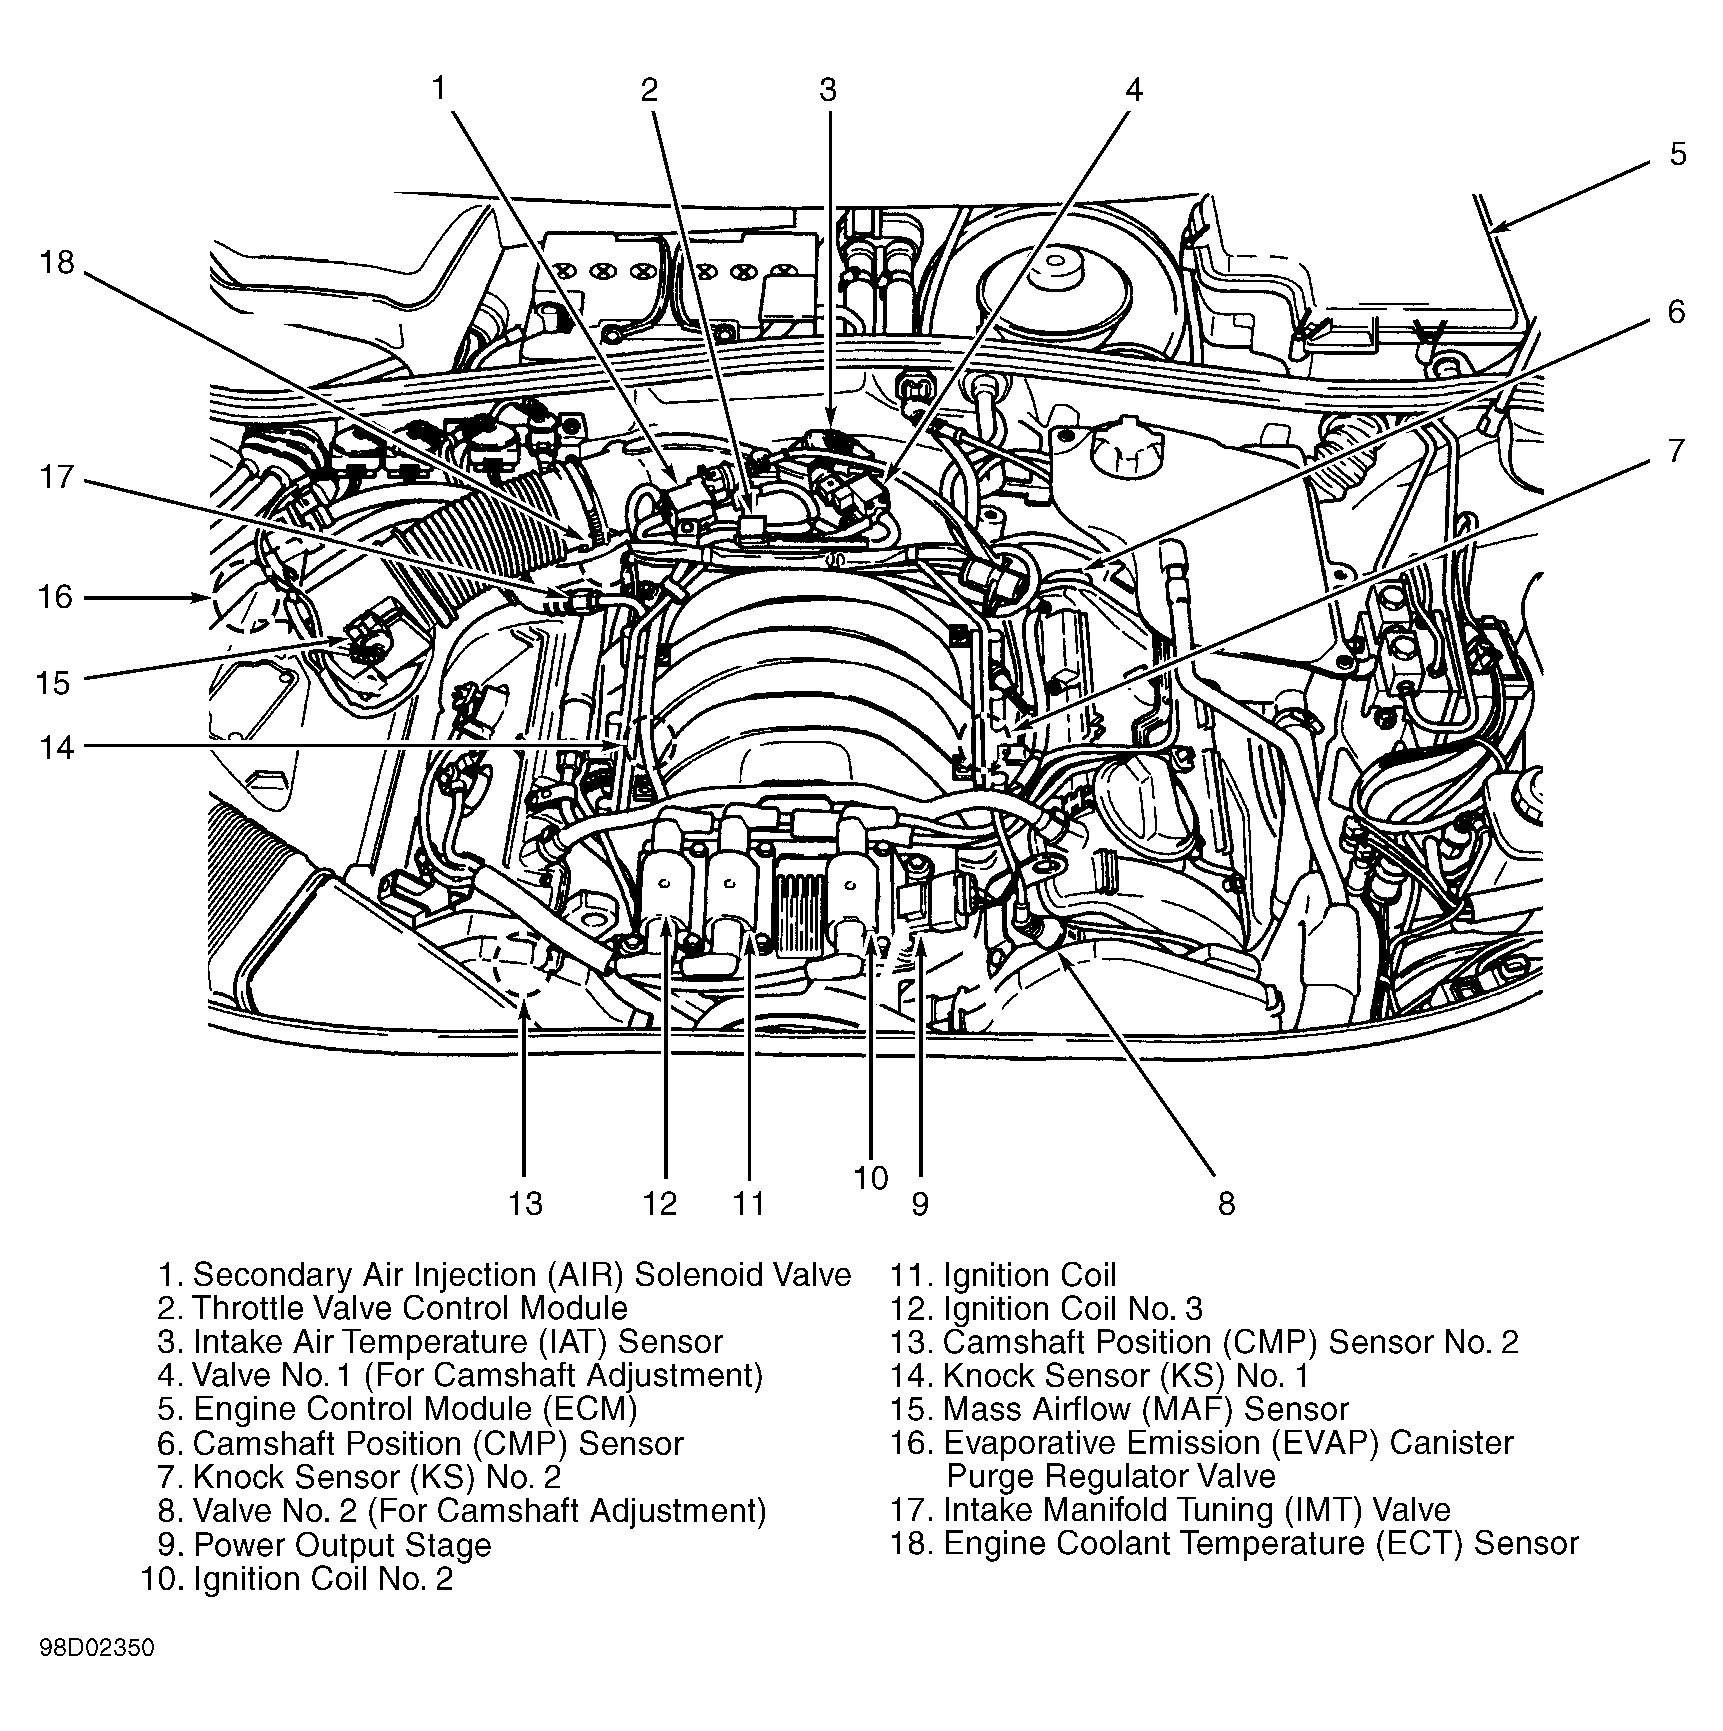 Chevy 3 1 Engine Diagram 2 Chevy 2 8 Engine Diagram Schema Wiring Diagram Of Chevy 3 1 Engine Diagram 2